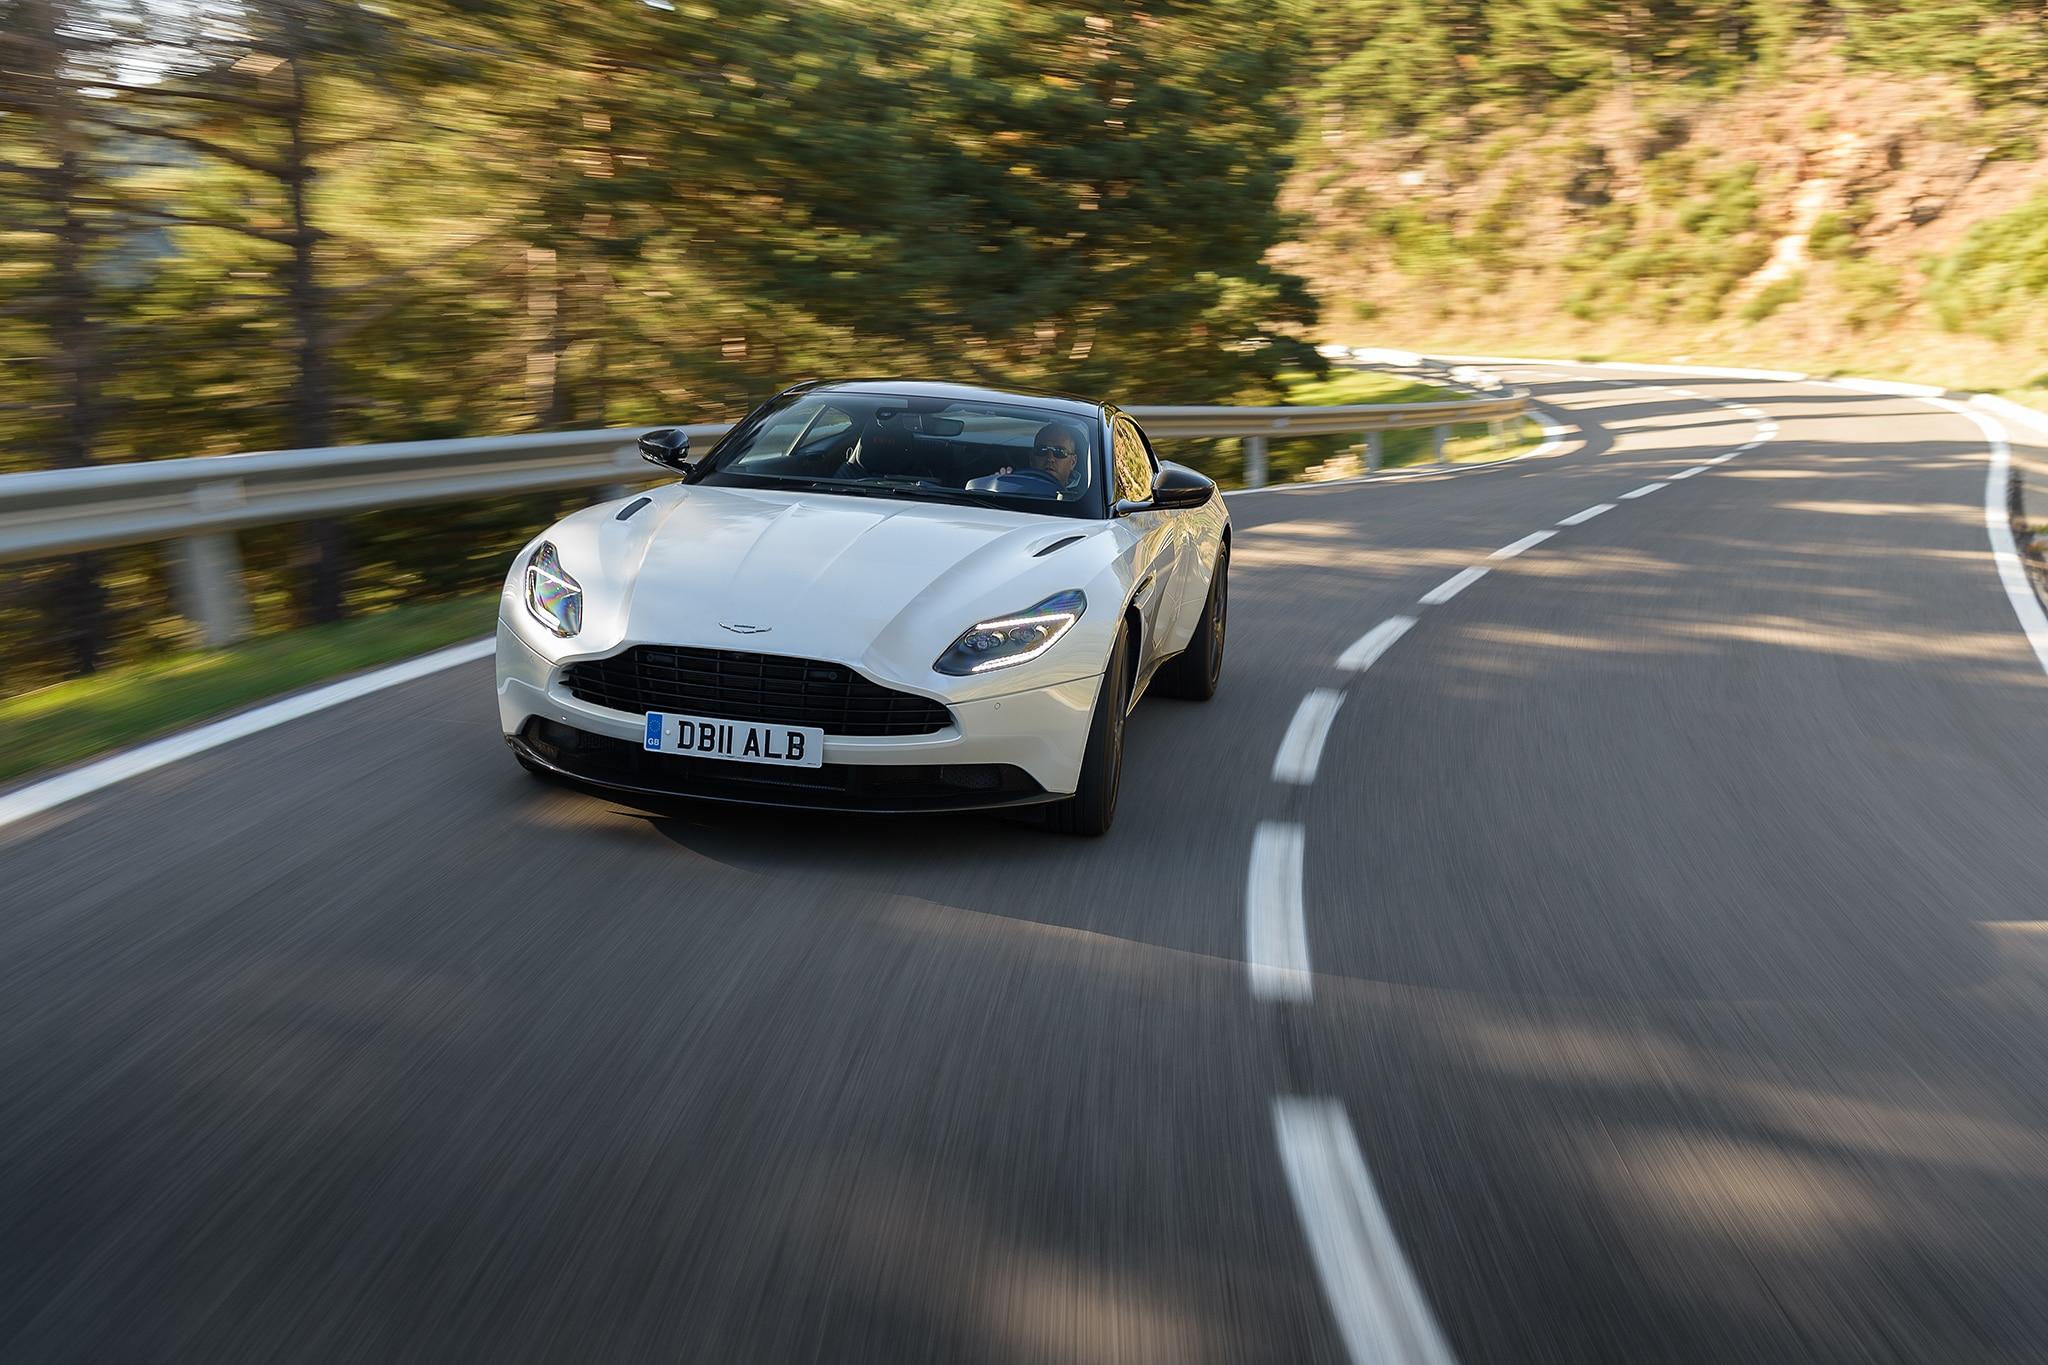 Aston Martin DB V First Drive Review Automobile Magazine - Aston martin 2018